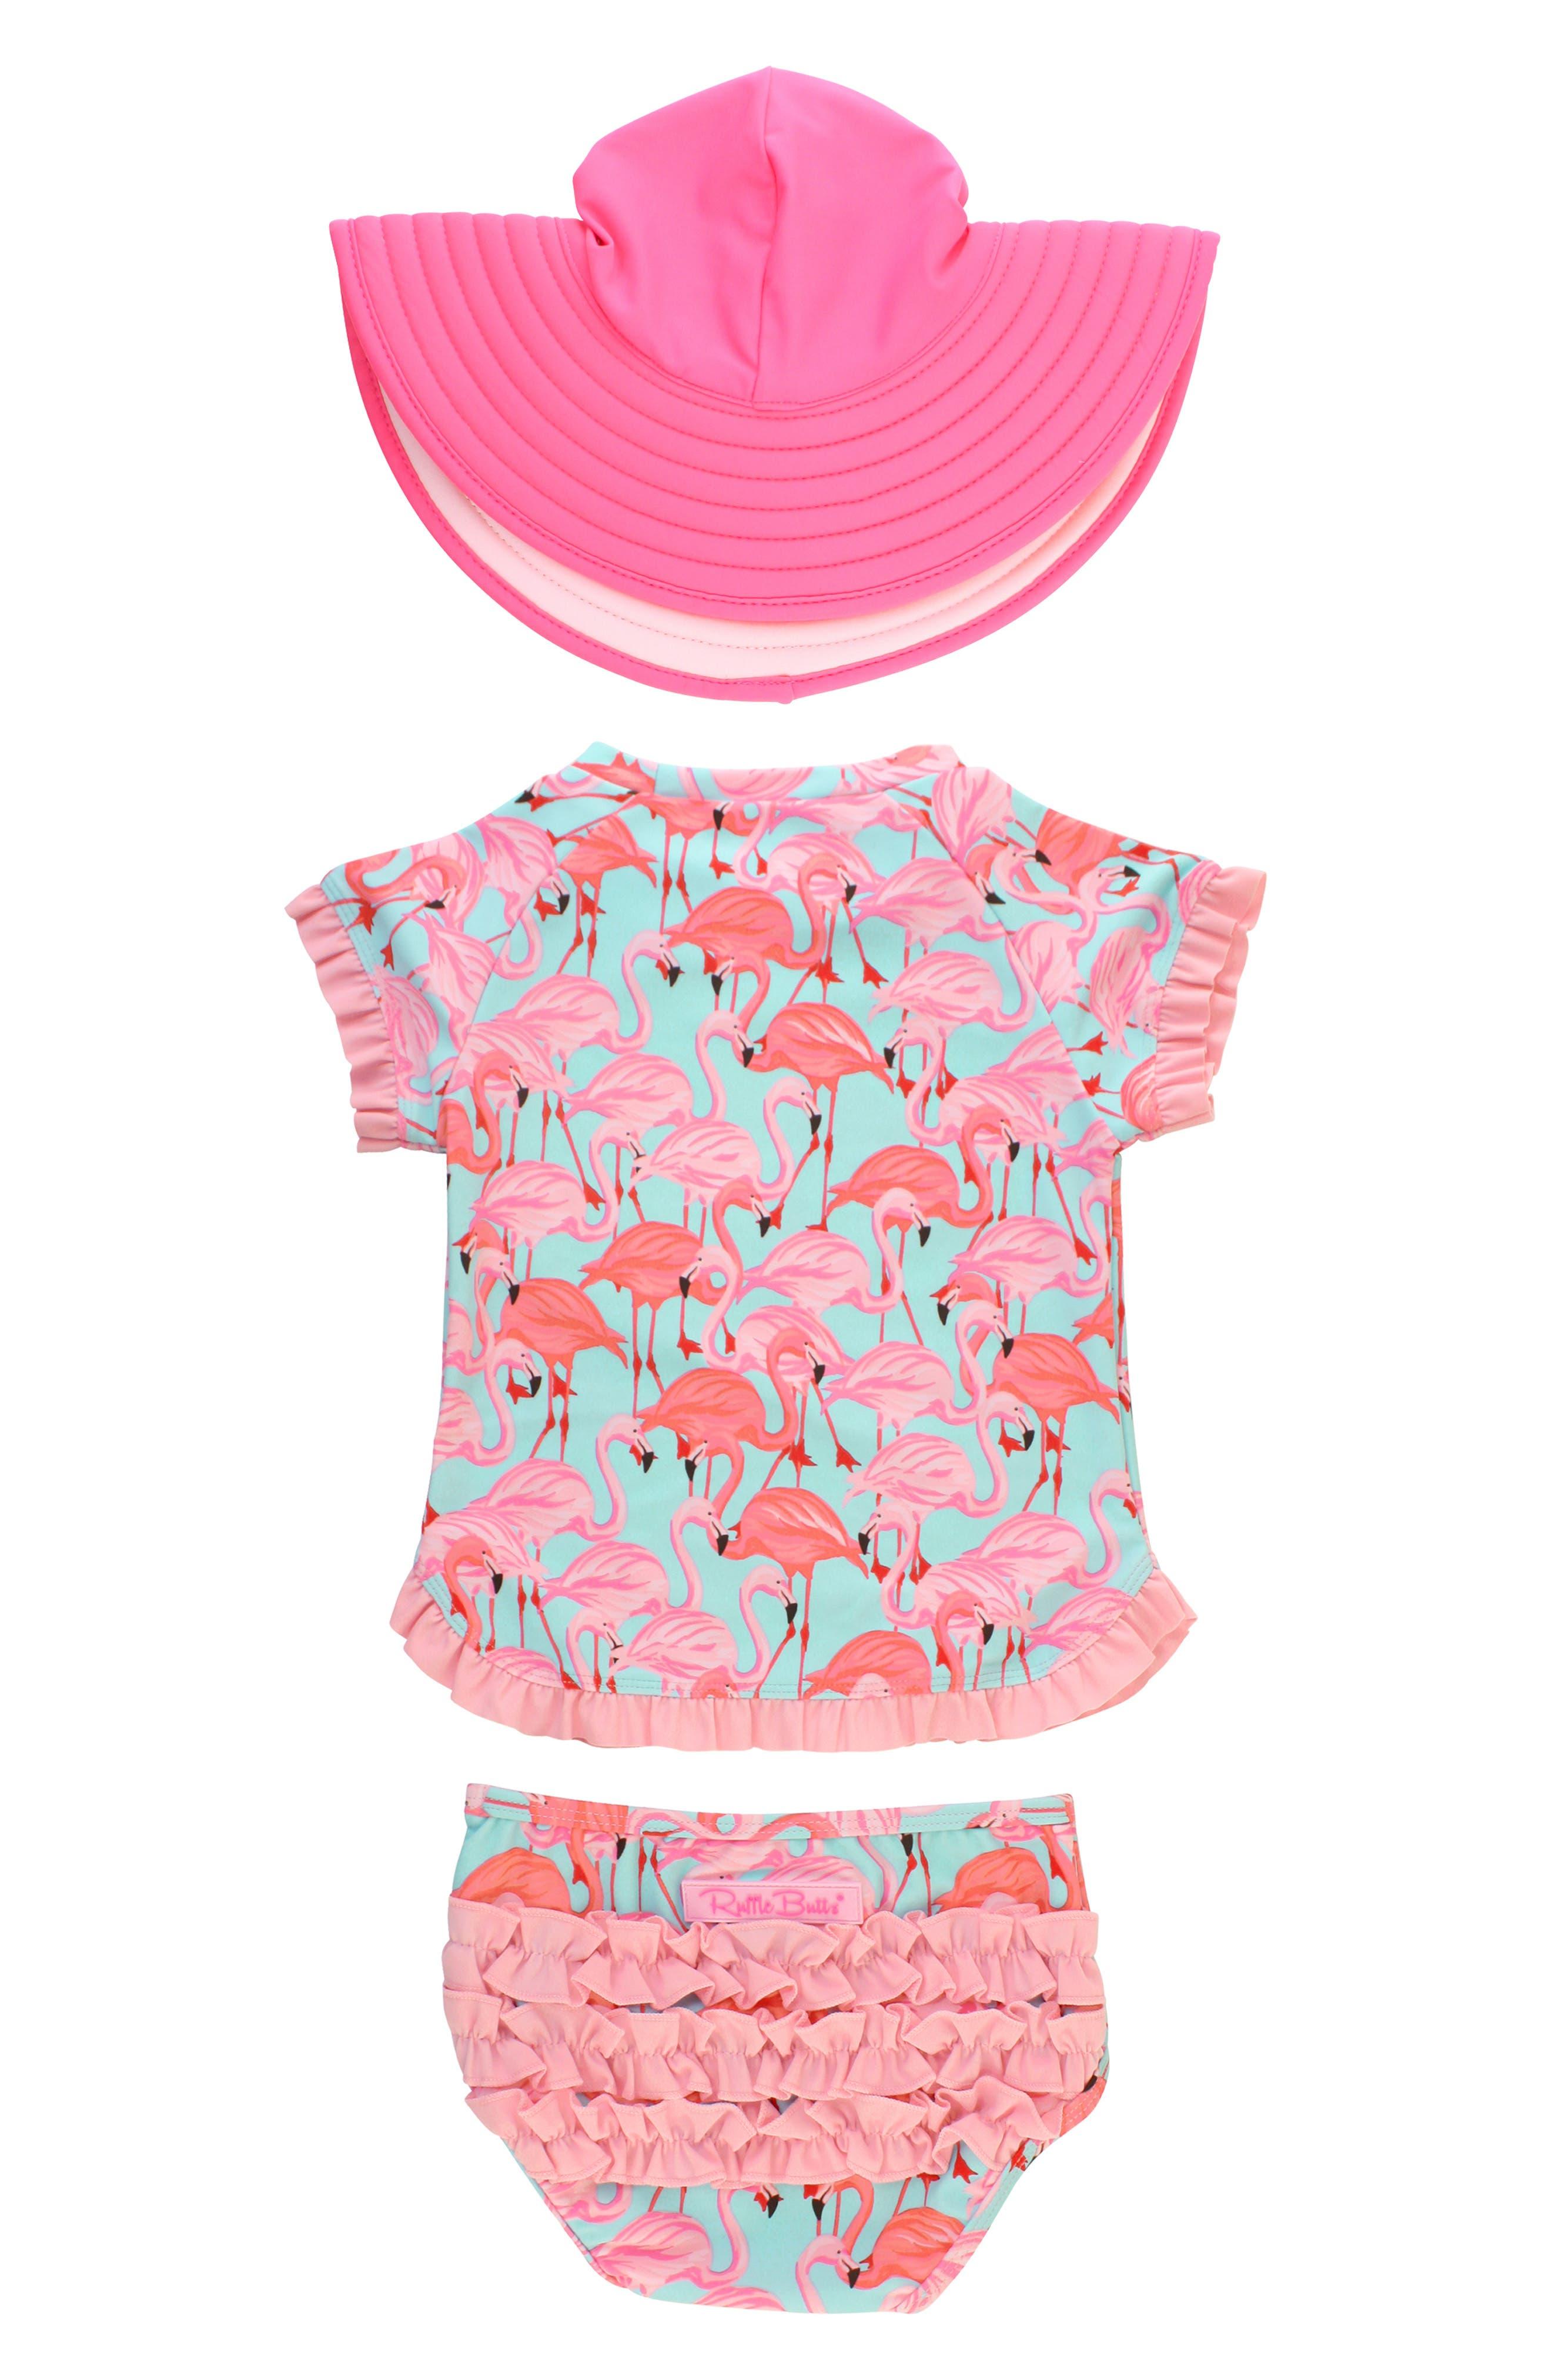 Rufflebutts flamingo two piece rashguard swimsuit hat set baby jpg 780x1196  Toddler flamingo hat a495be91bfbe